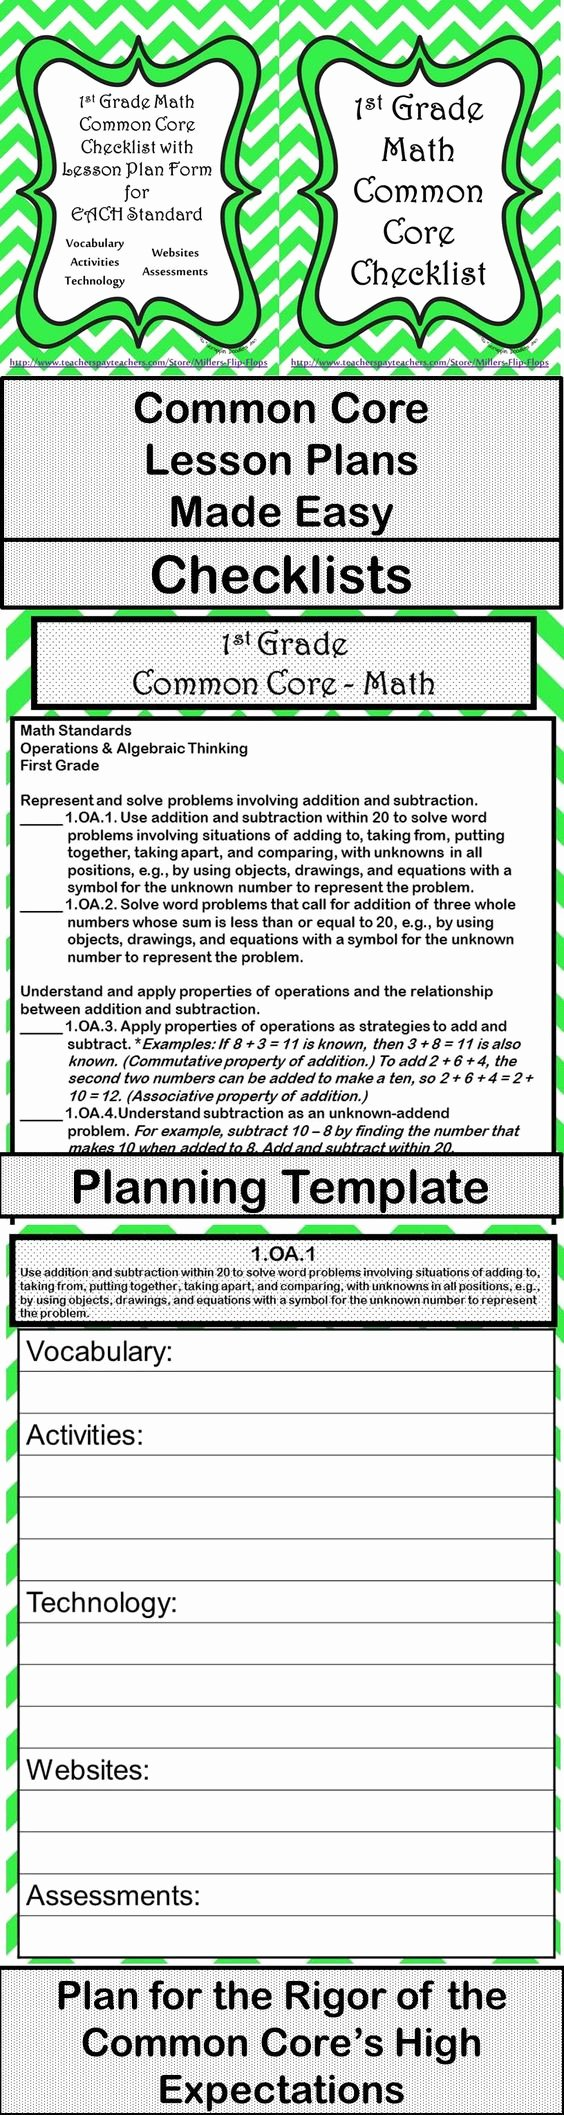 2nd Grade Lesson Plan Template Luxury 1st Grade Math Mon Core Checklist Lesson Planning